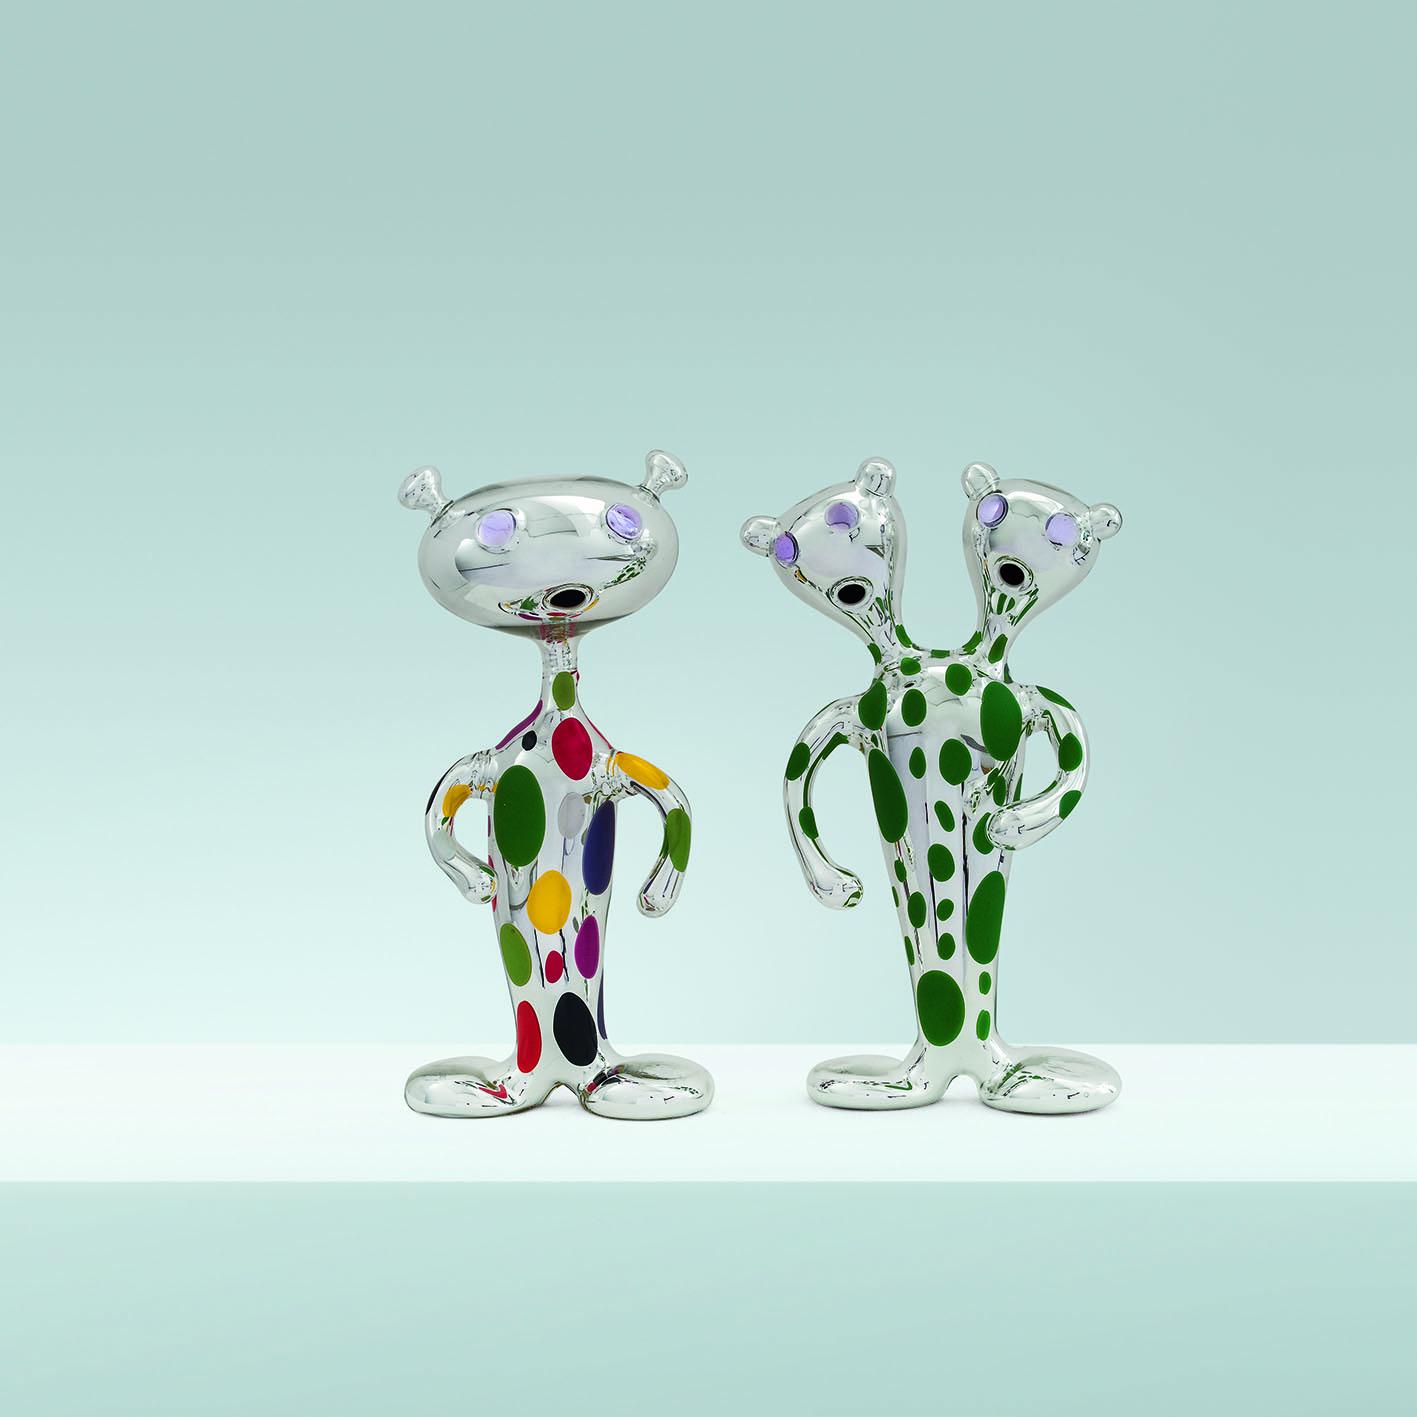 The Best of Glass artist: Massimo Lunardon glass work The Best of Glass work and Lampworking art: Massimo Lunardon Massimo Lunardon Figures 1